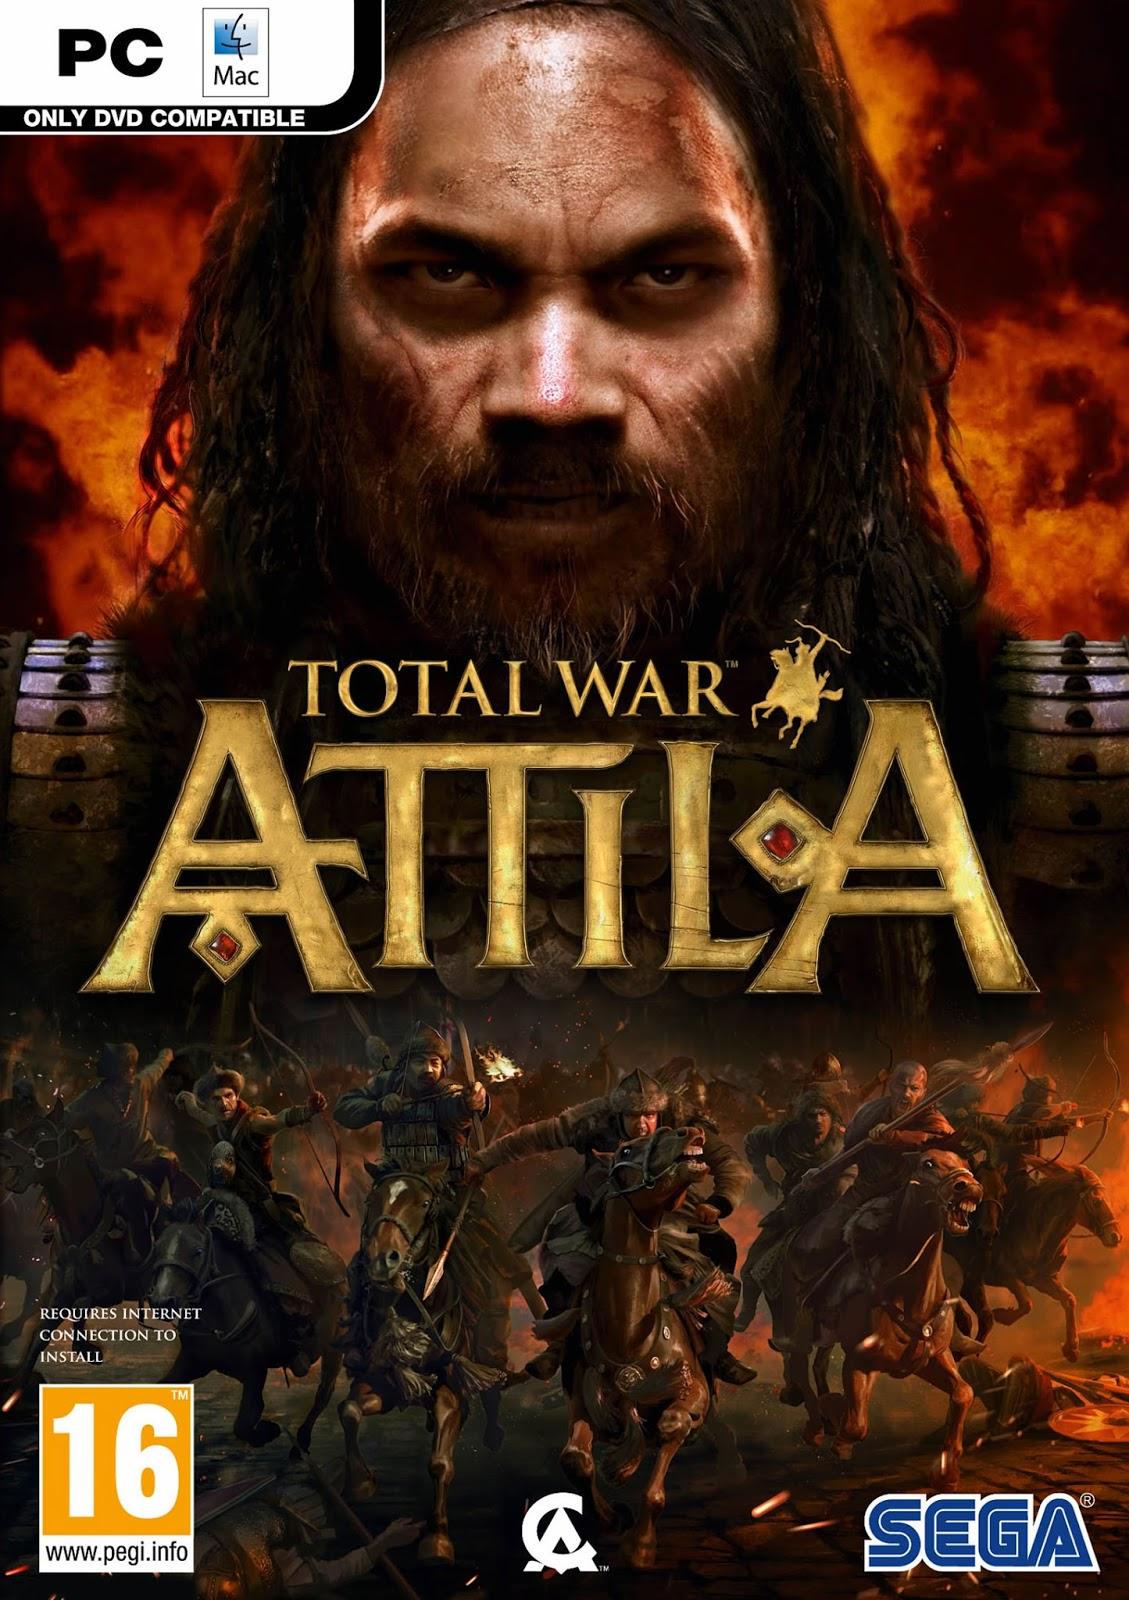 Total War Attila ESPAÑOL Full PC Incluye DLC Cover Caratula